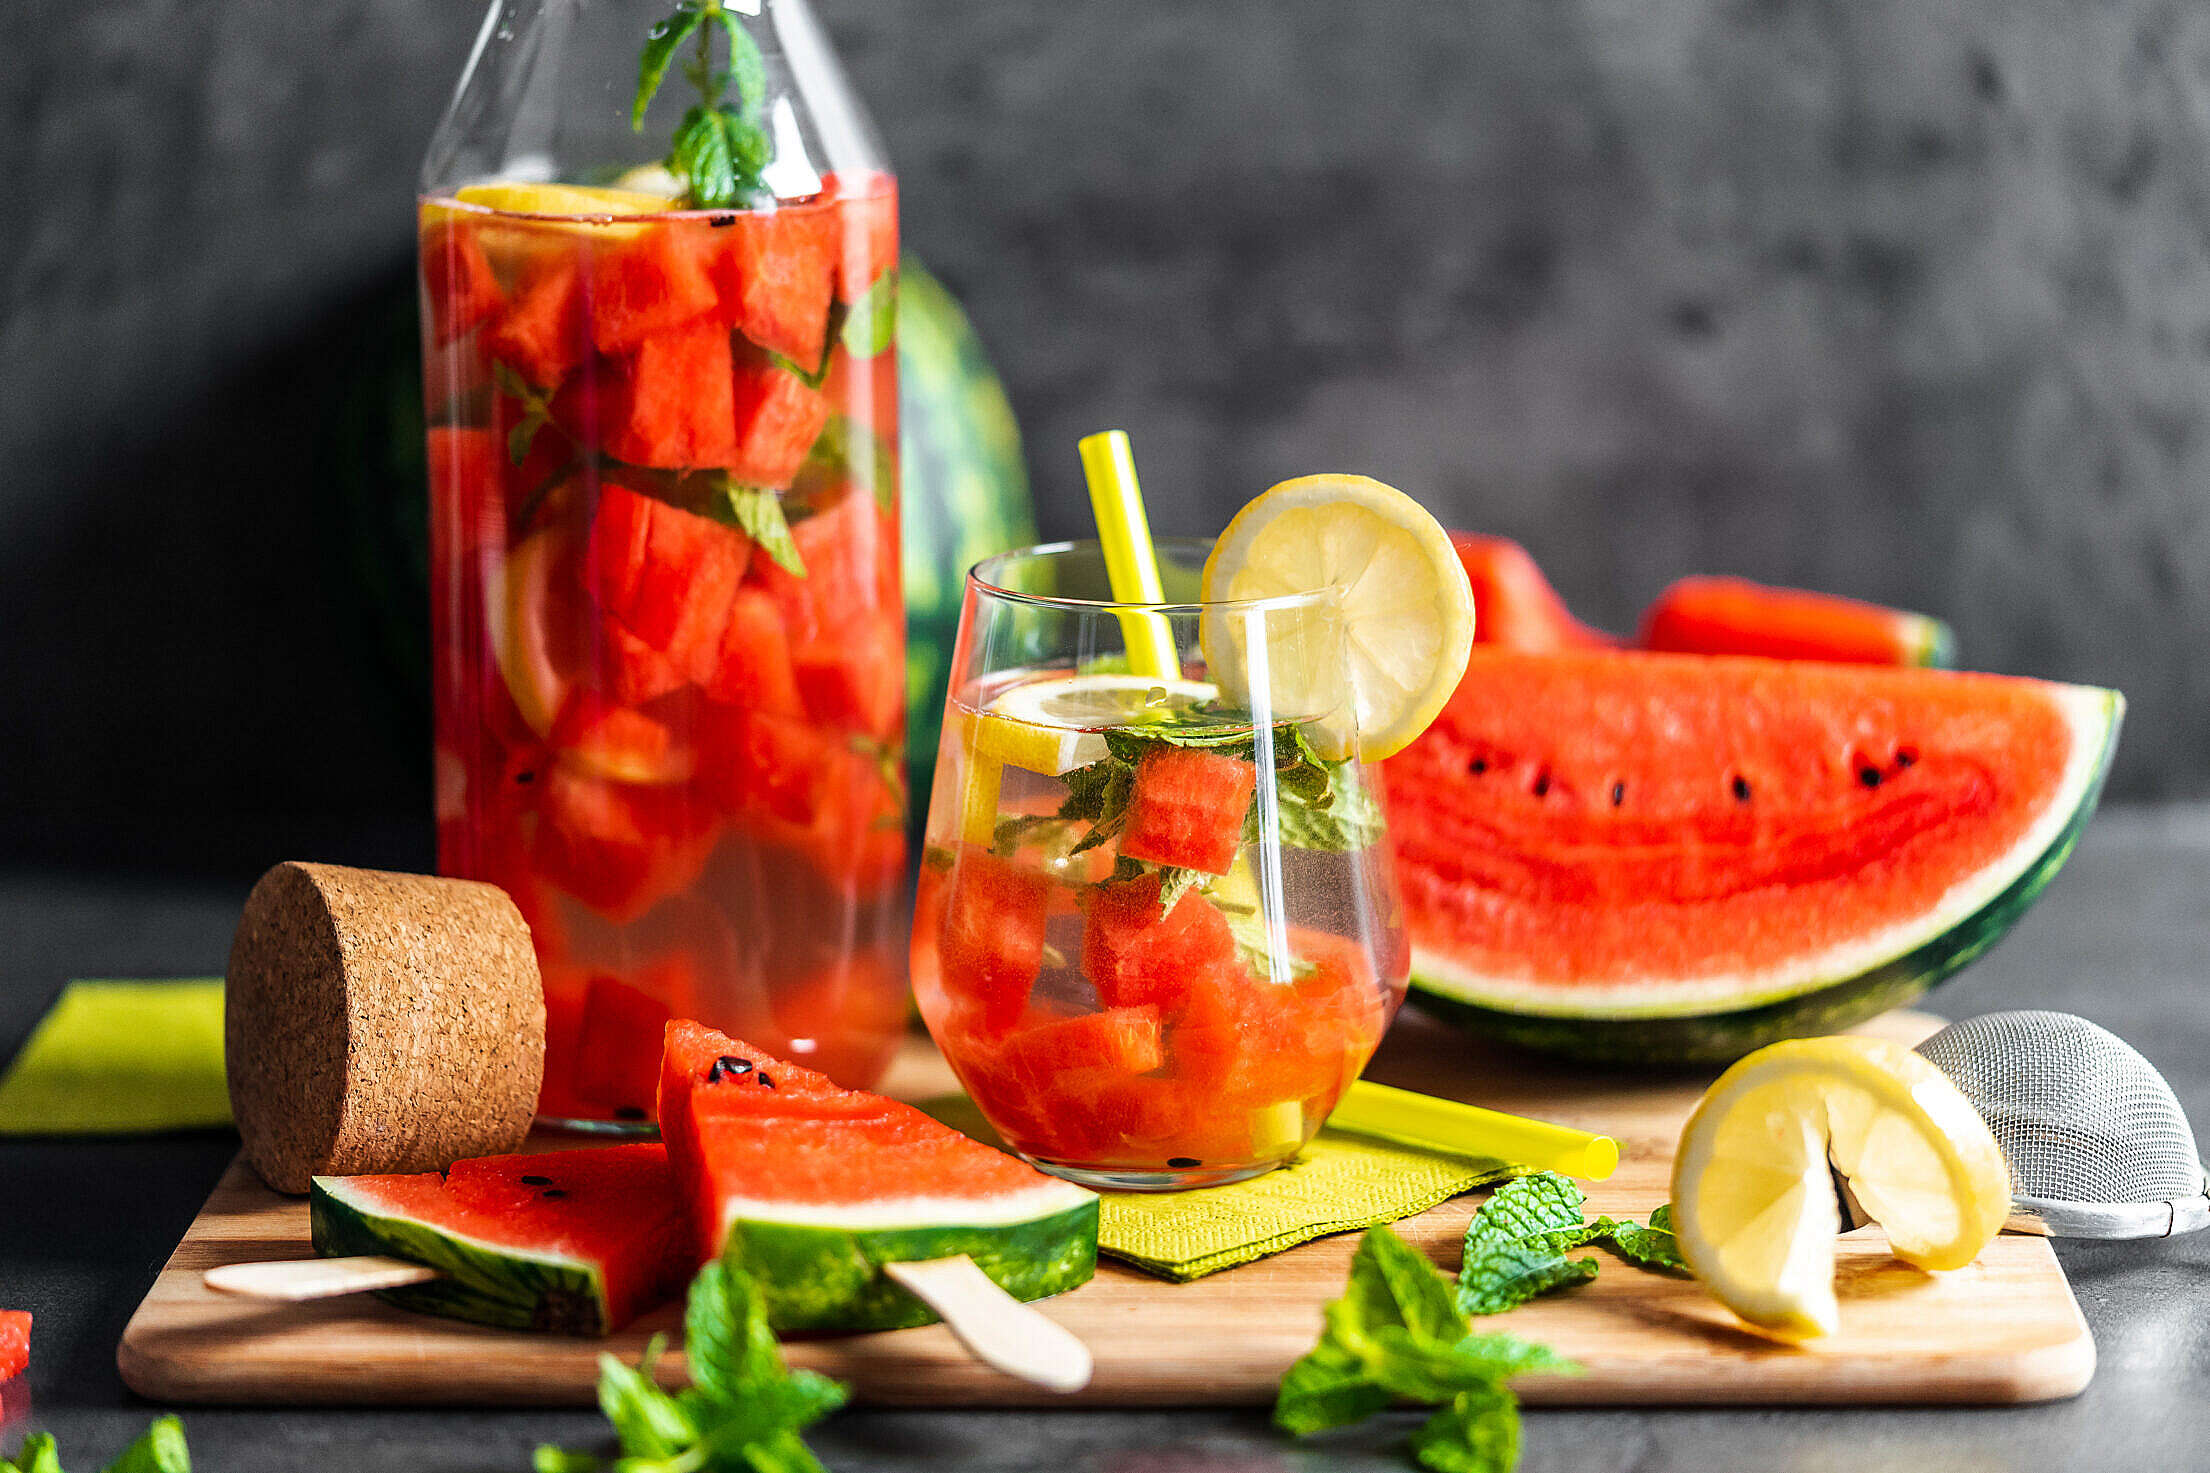 Melon Lemonade and Watermelon Popsicles Free Stock Photo